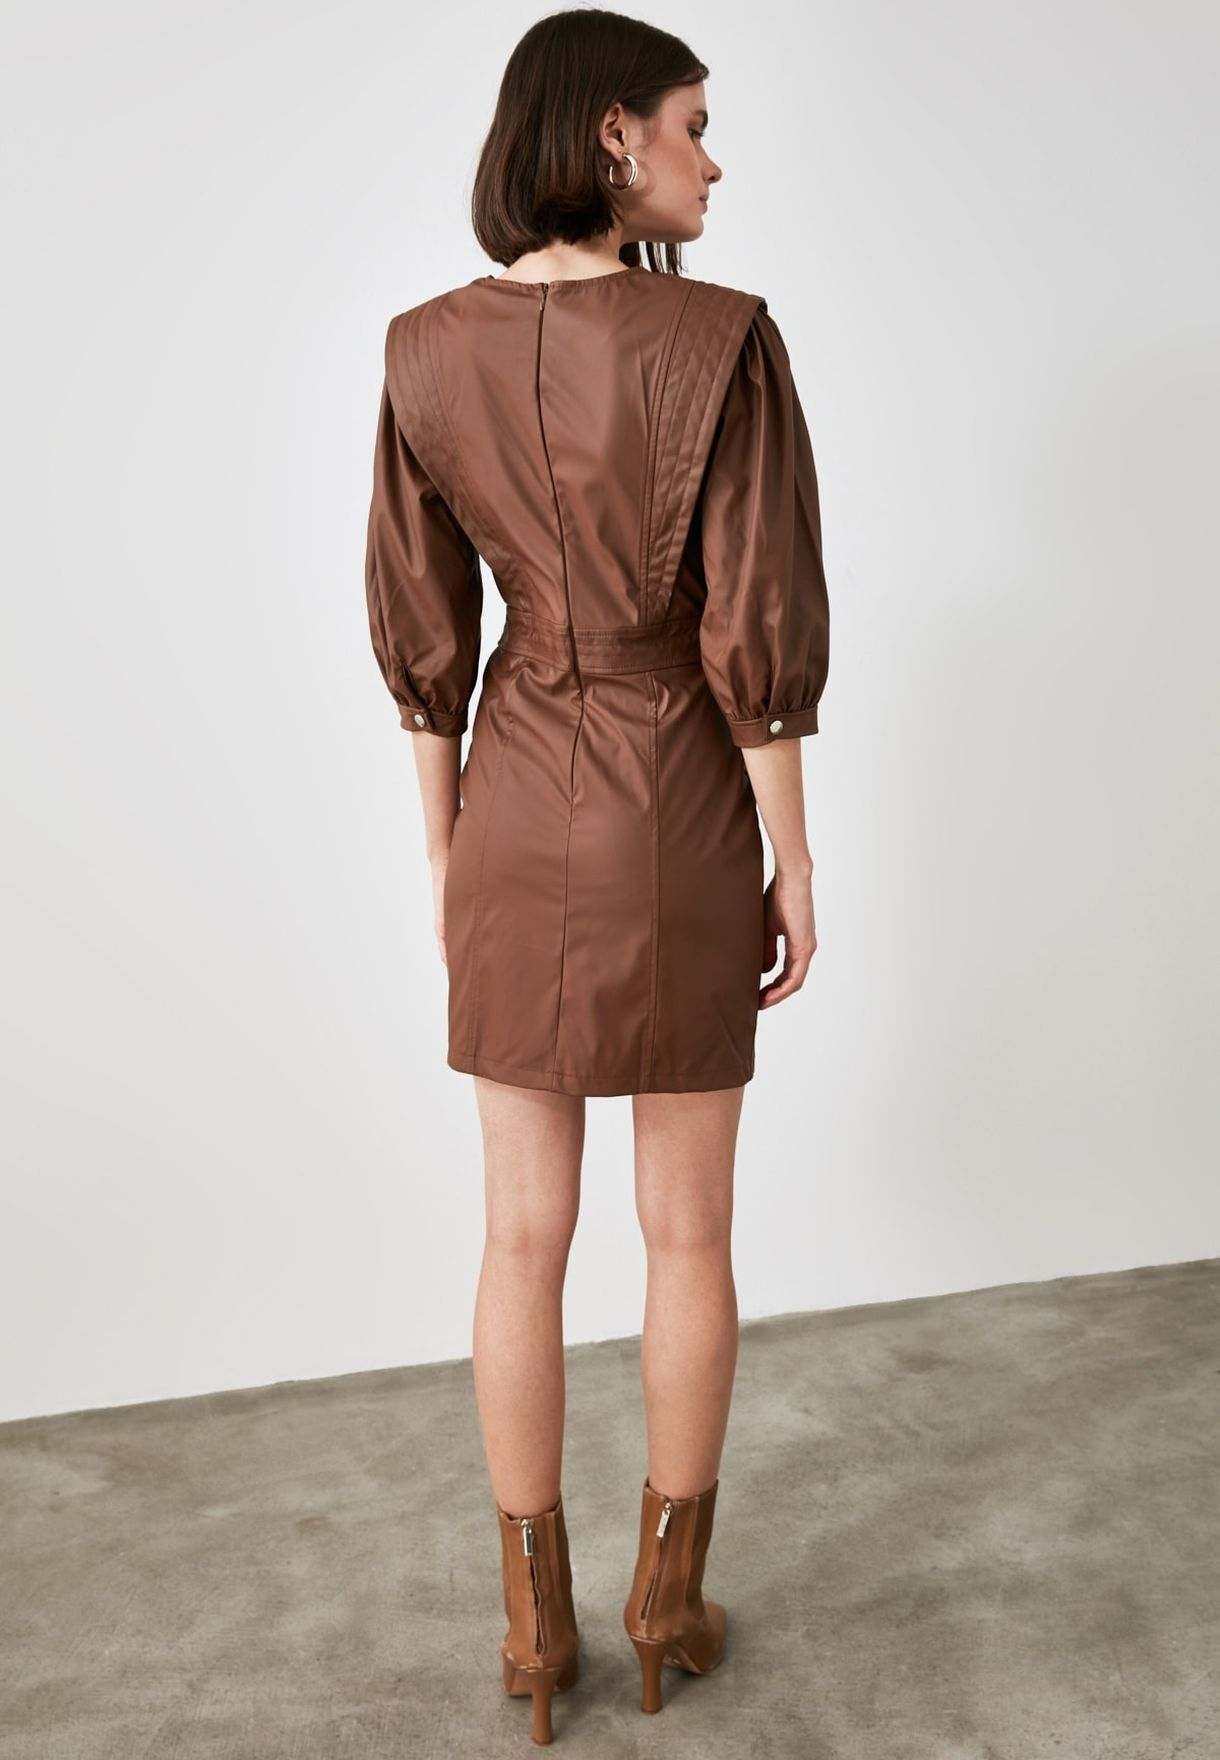 Puff Sleeve Bodycon Dress